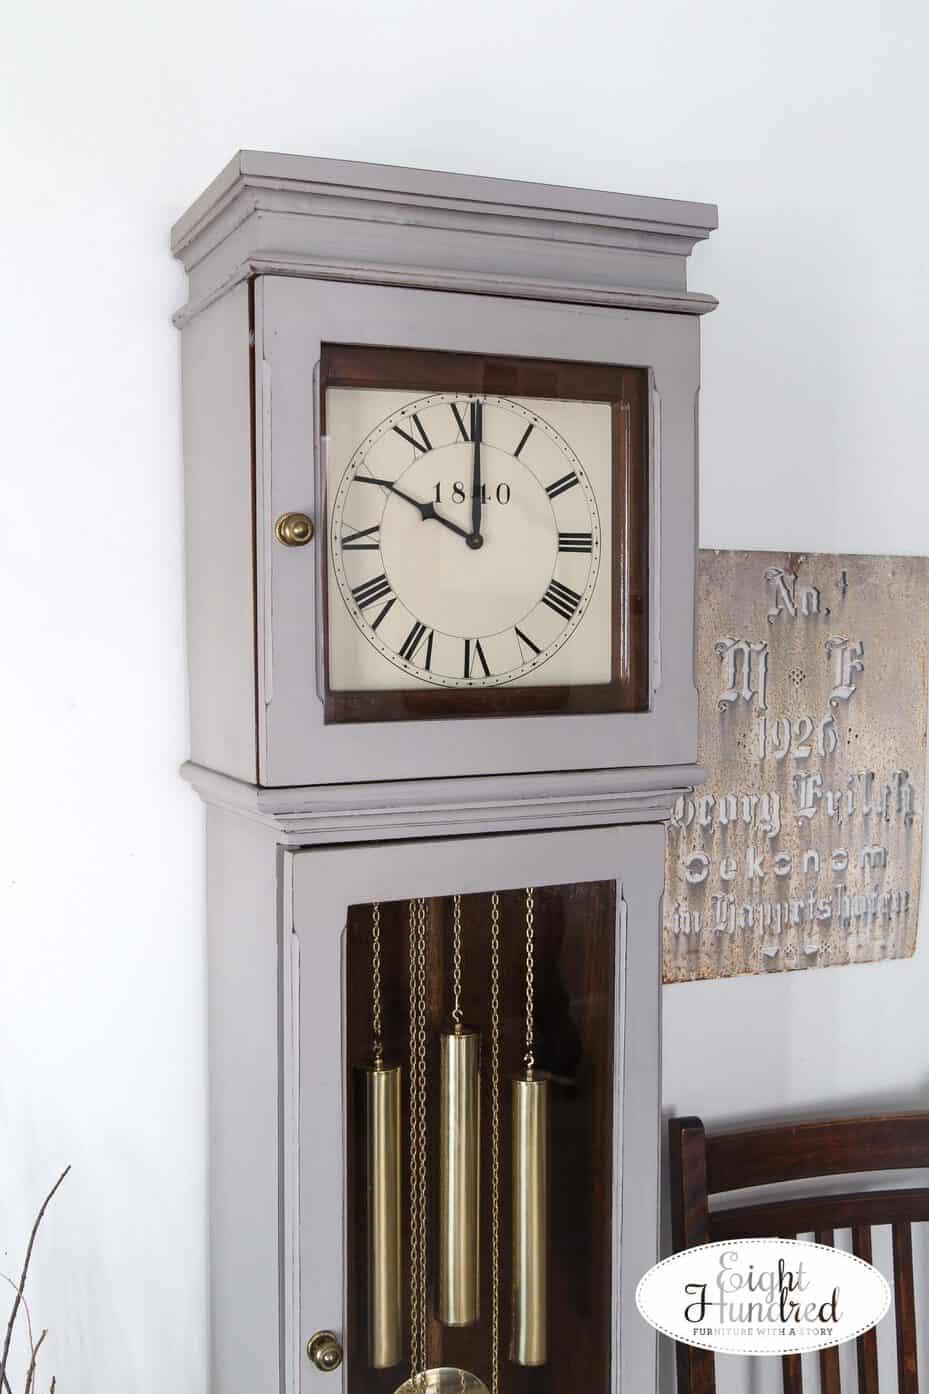 Grandmother Clock top in schloss